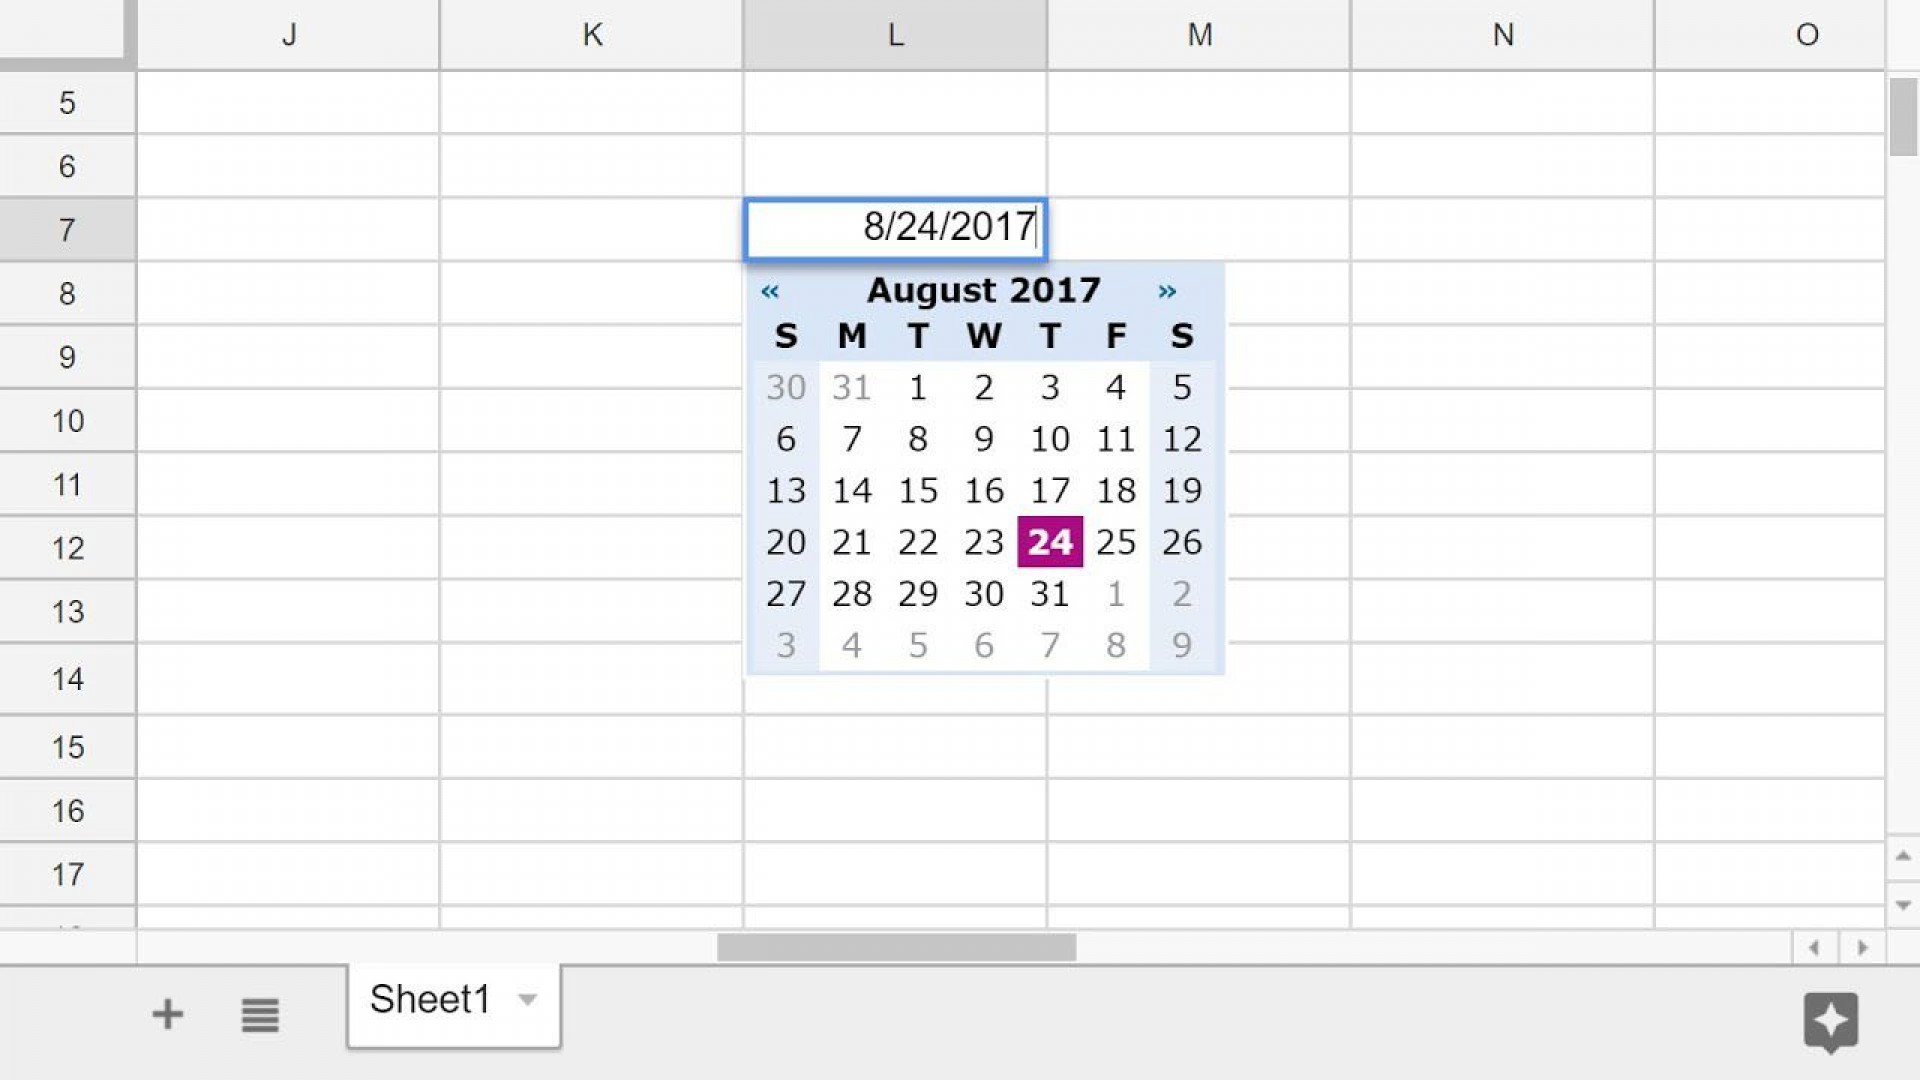 007 Formidable Google Calendar Template 2017 Highest Quality 1920